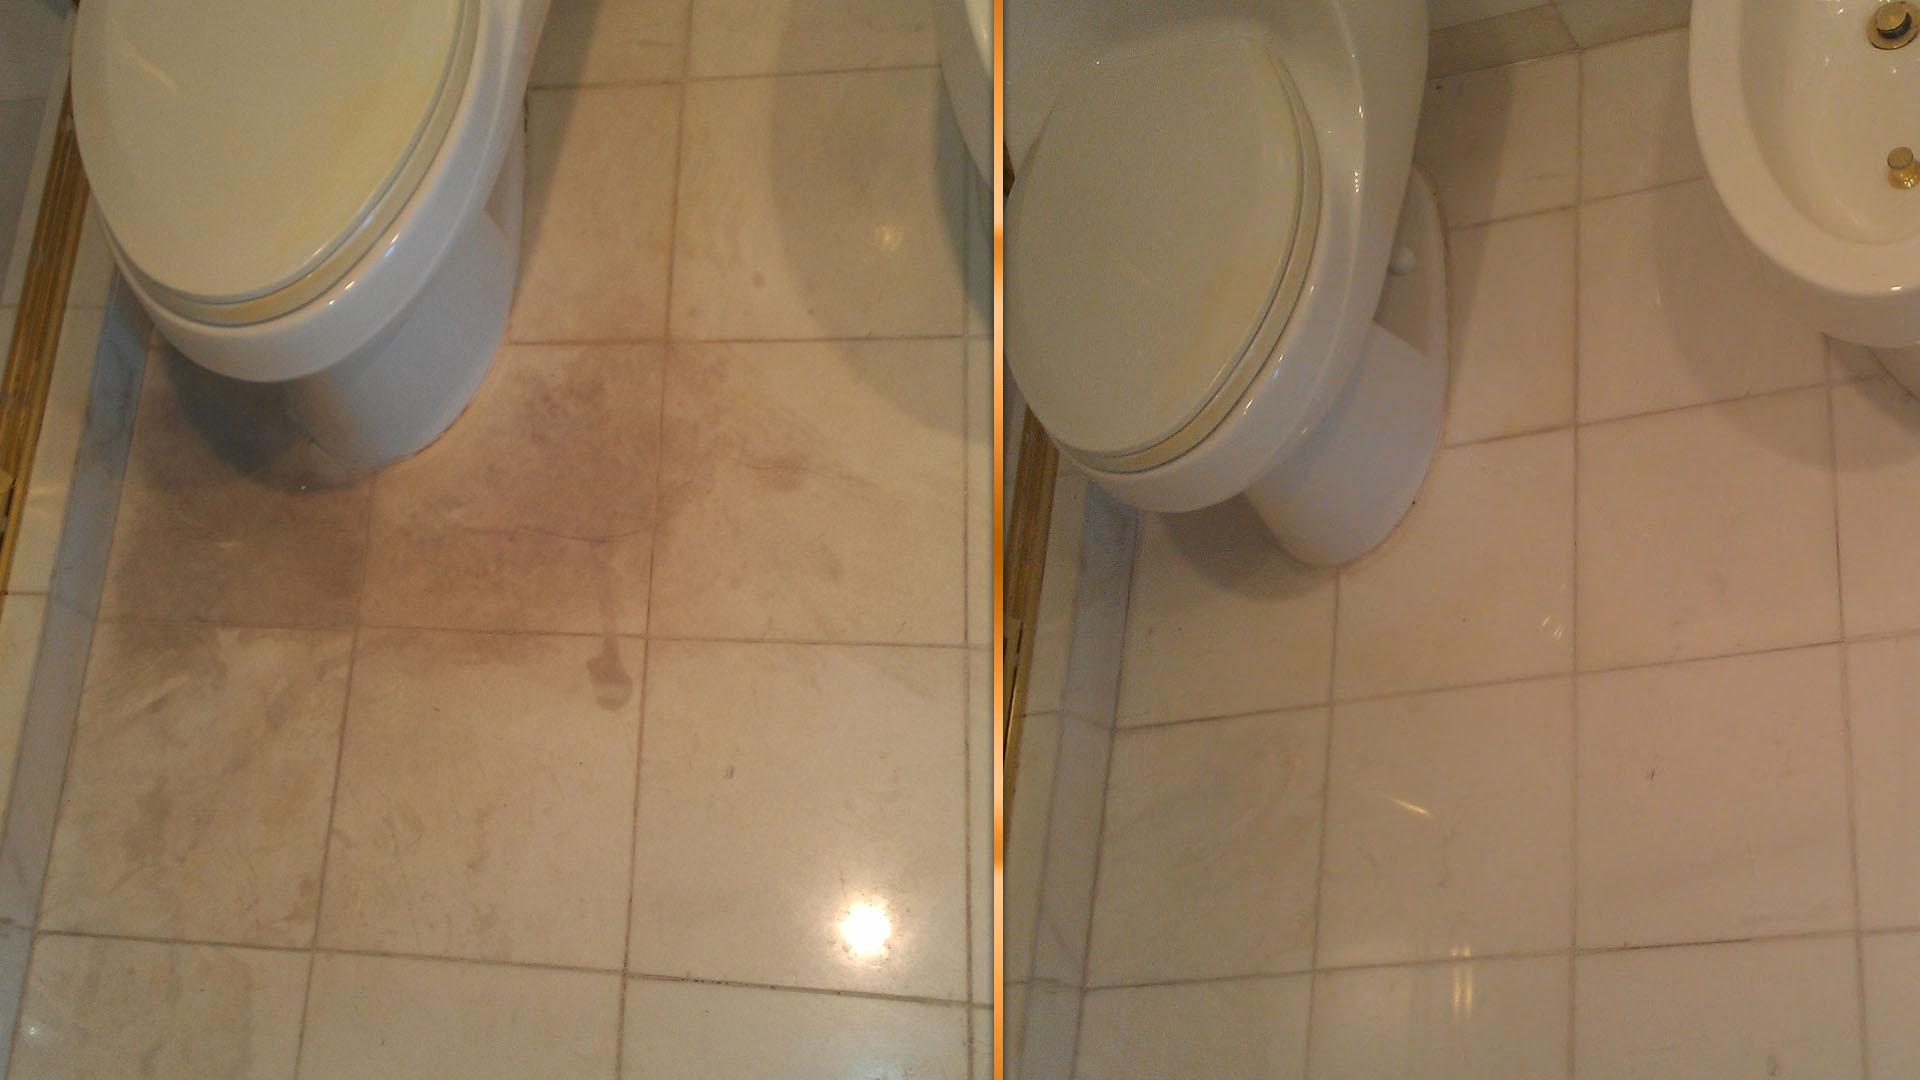 bna-bathroom-floor2-300x169